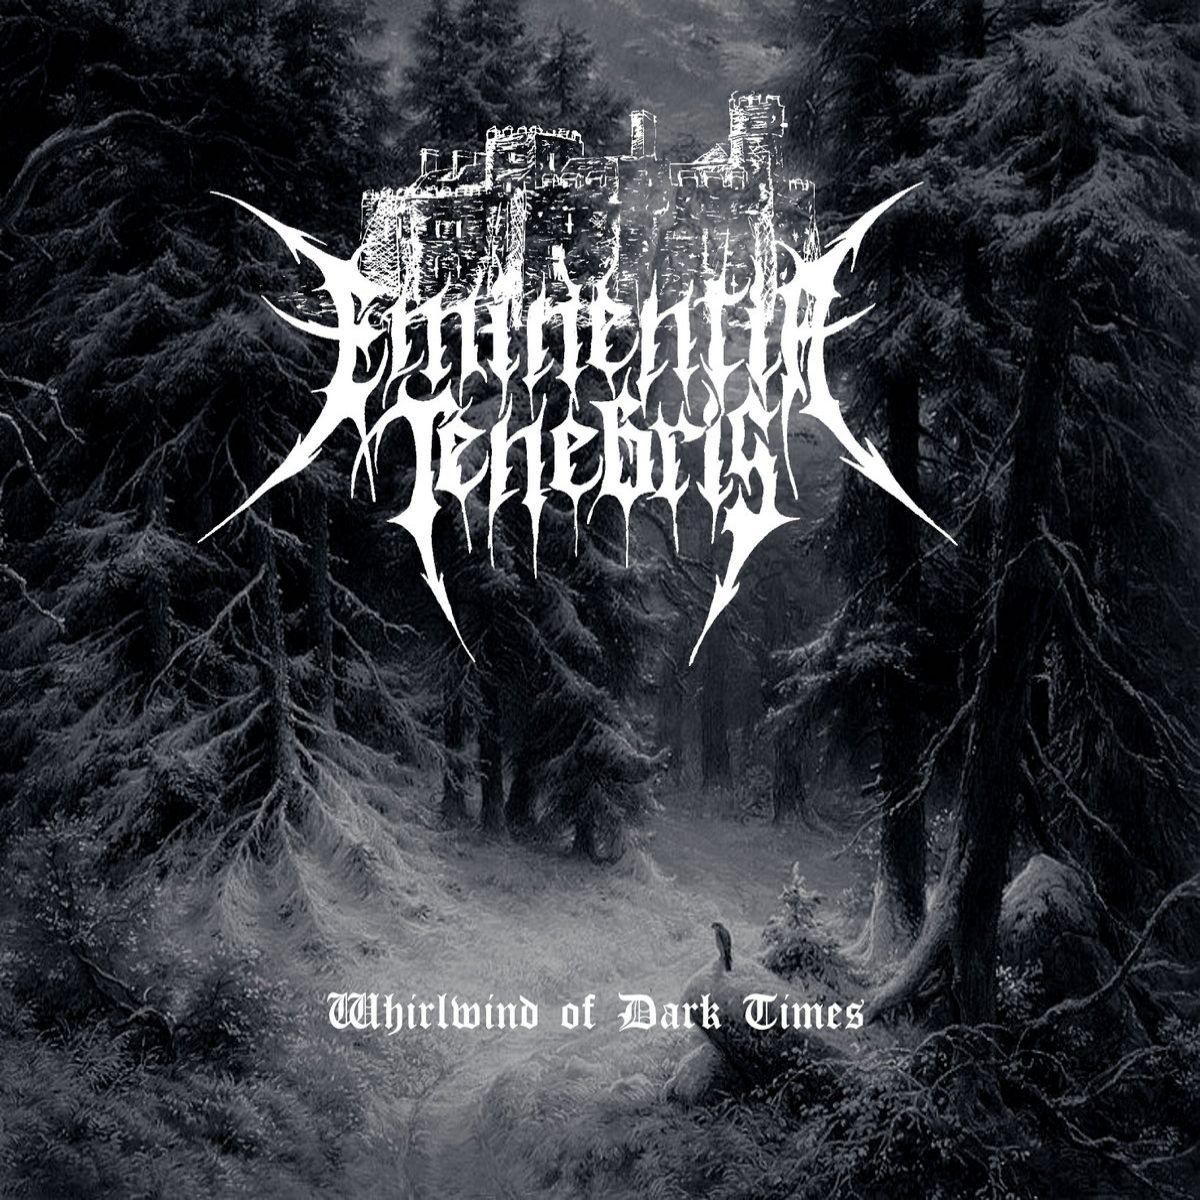 Eminentia Tenebris - Whirlwind of Dark Times